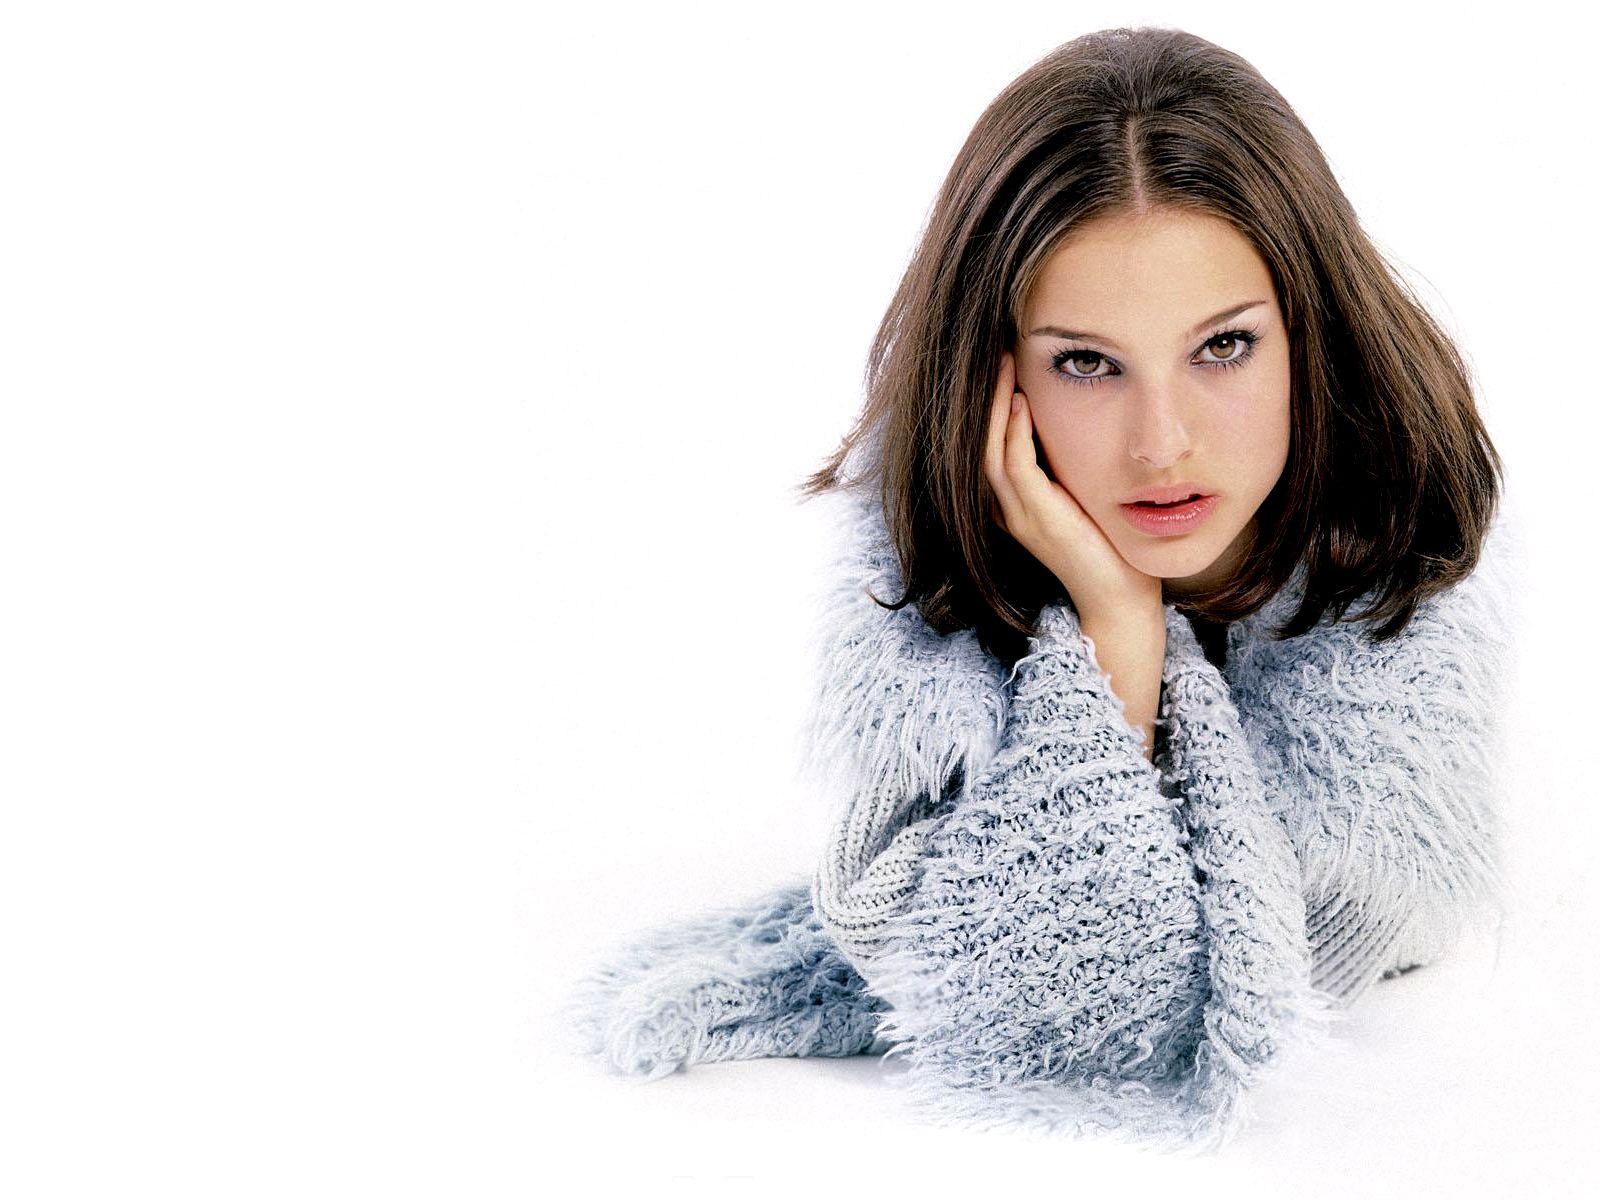 http://www.zastavki.com/pictures/1600x1200/2008/Girls_Natalie_Portman_008745_.jpg